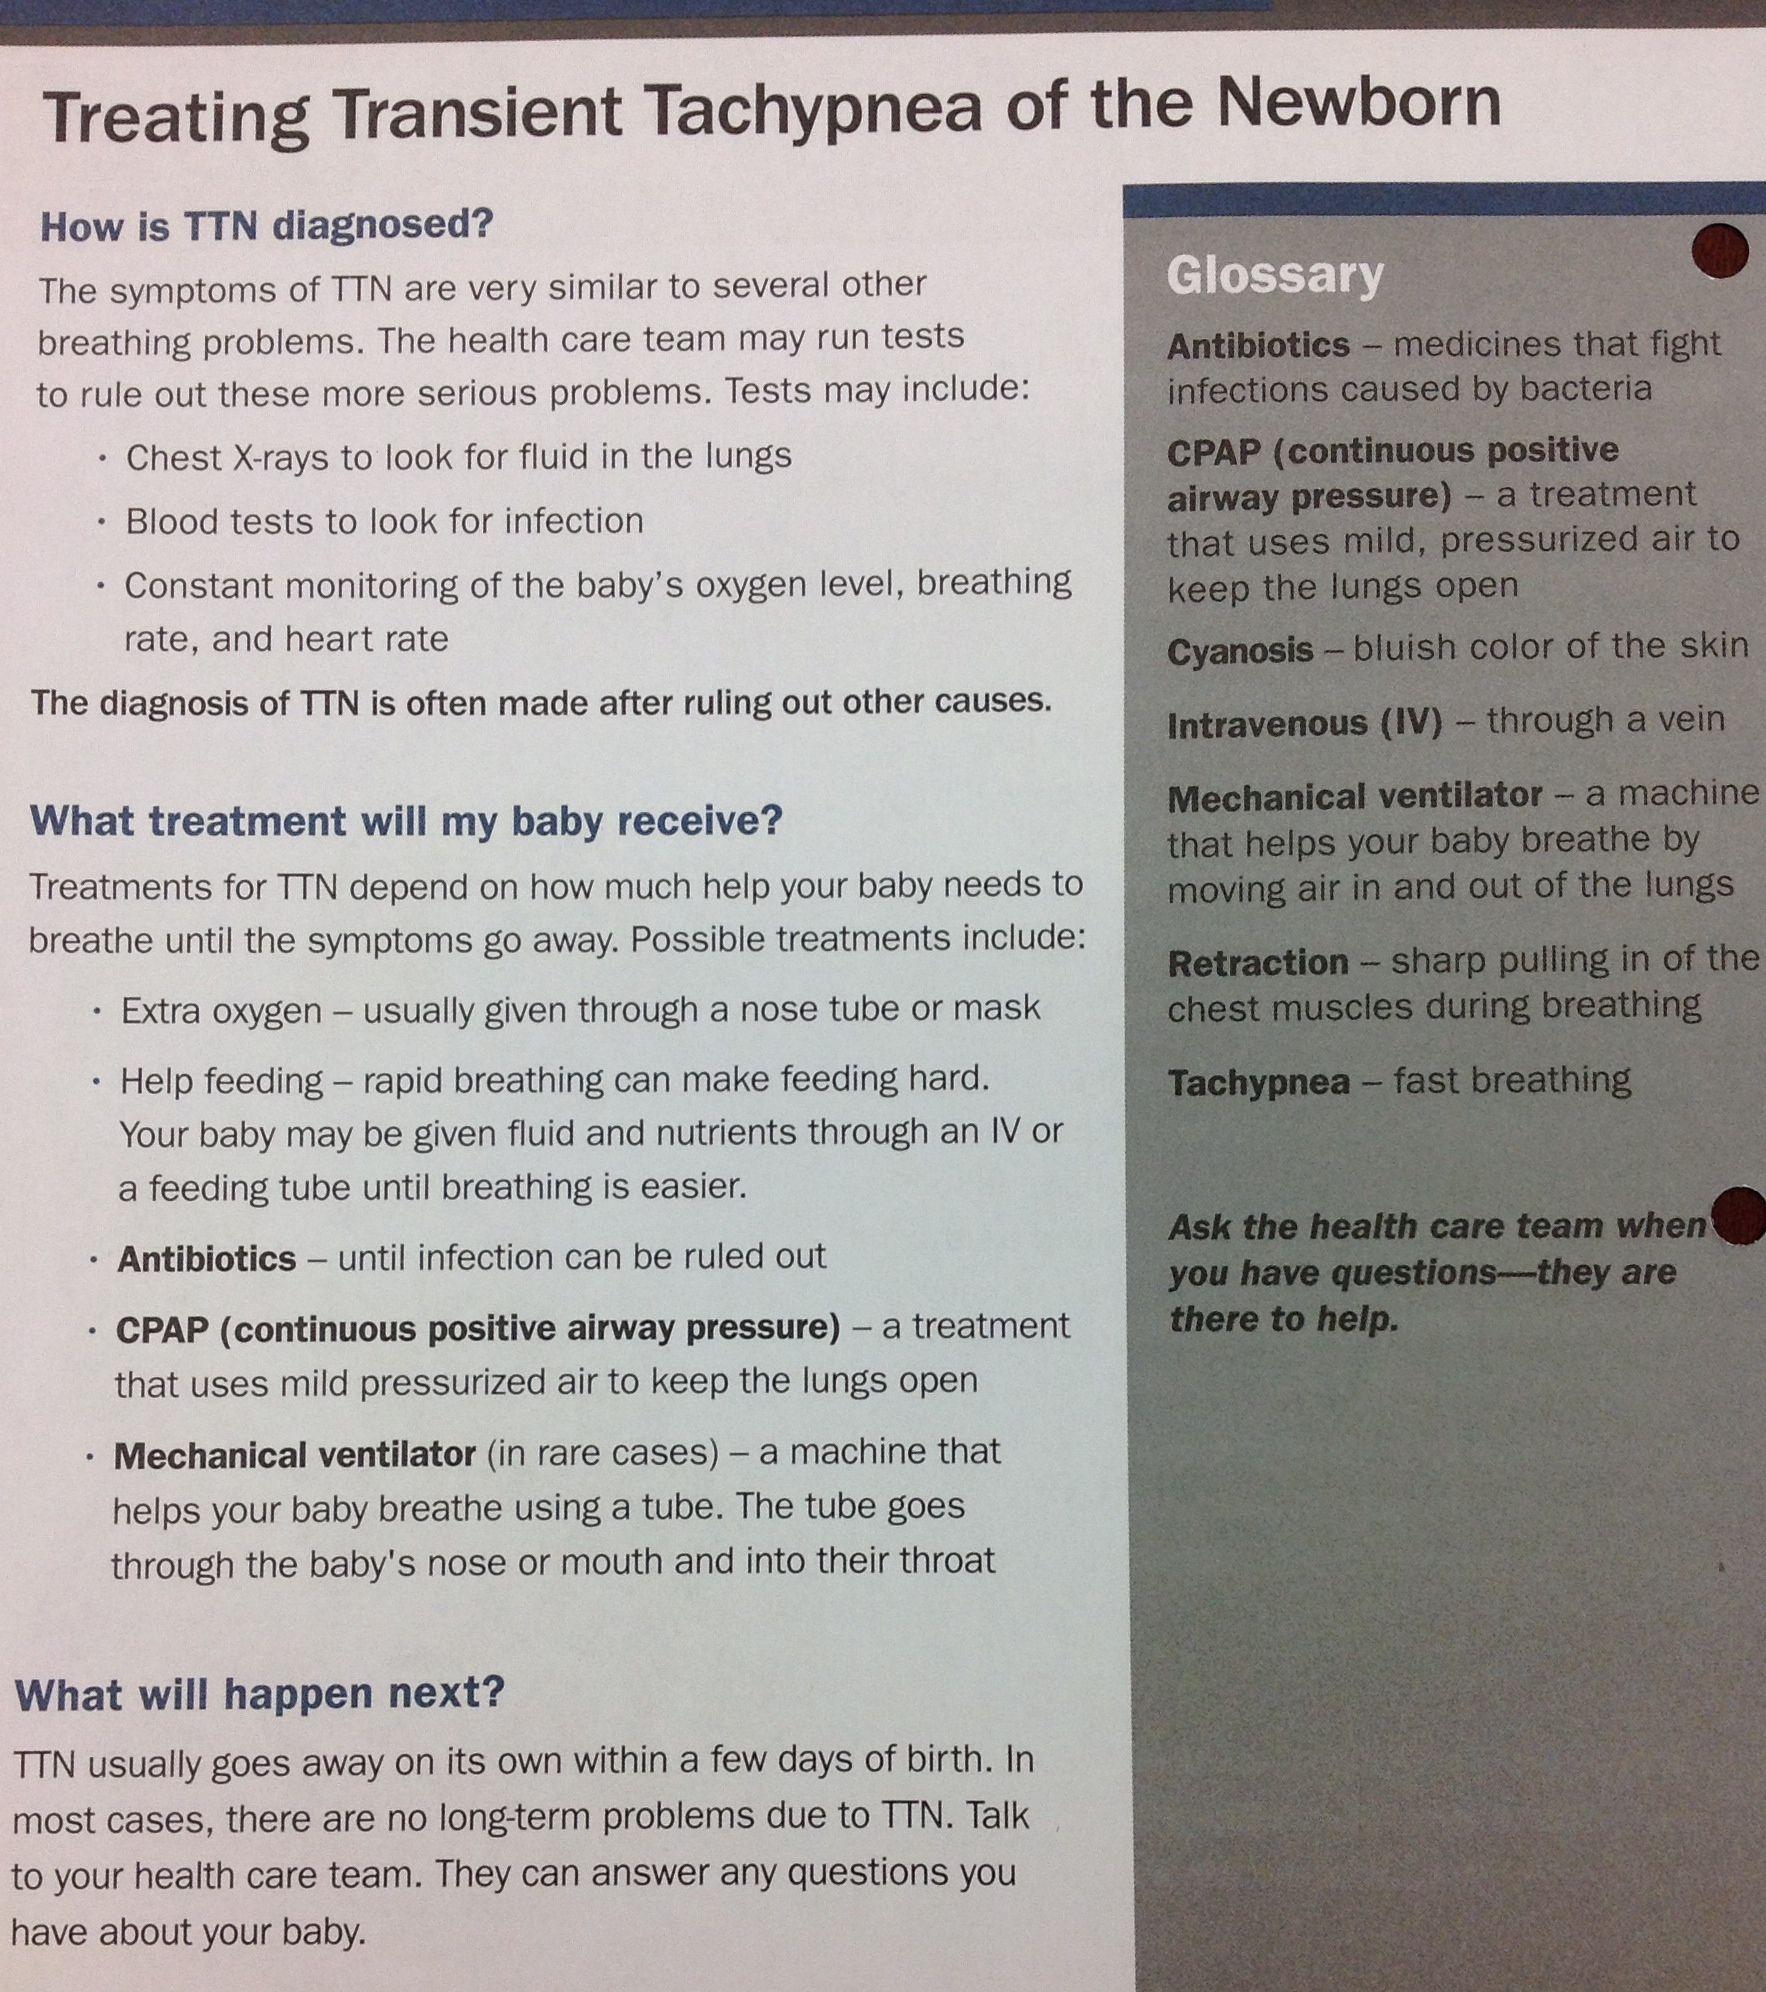 Treating Transient Tachypnea Of The Newborn Ttn Treatmentoptions Babyhealth